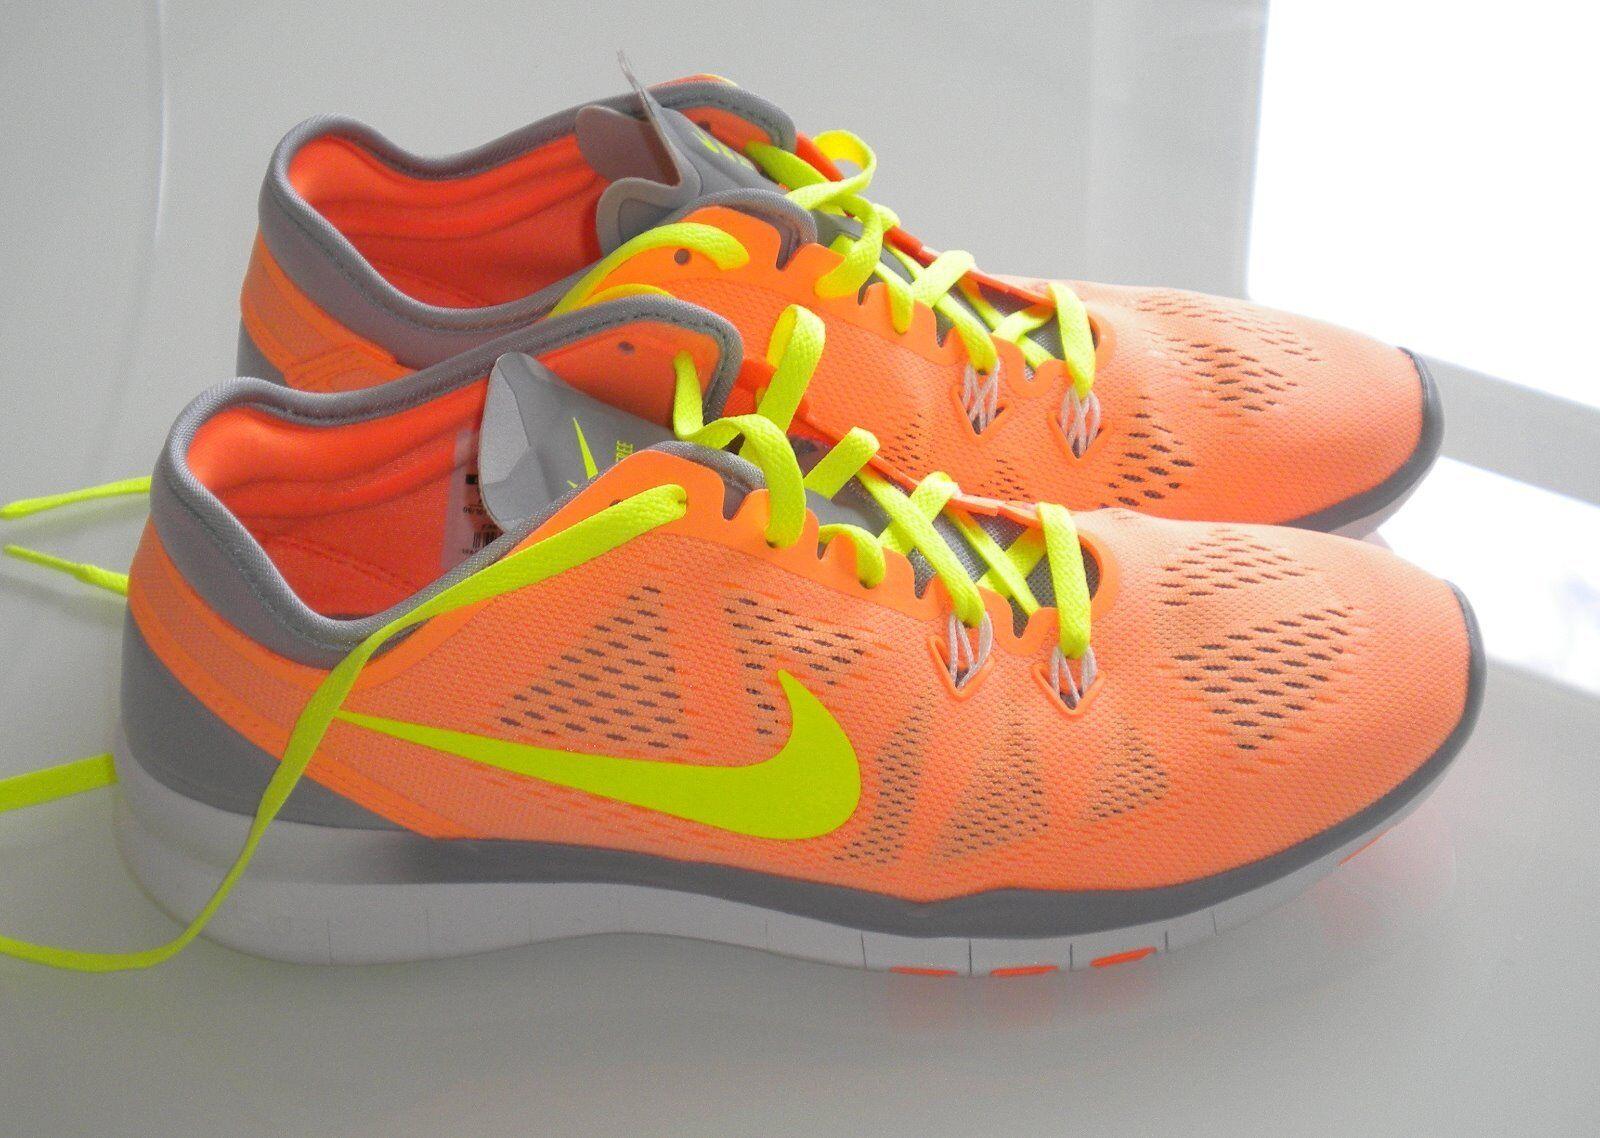 Wmns Nike Free 5.0 5.0 5.0 TR FIT 5  Schuhe Running Sneaker ORANGE PEACH CREAM 70ab6a